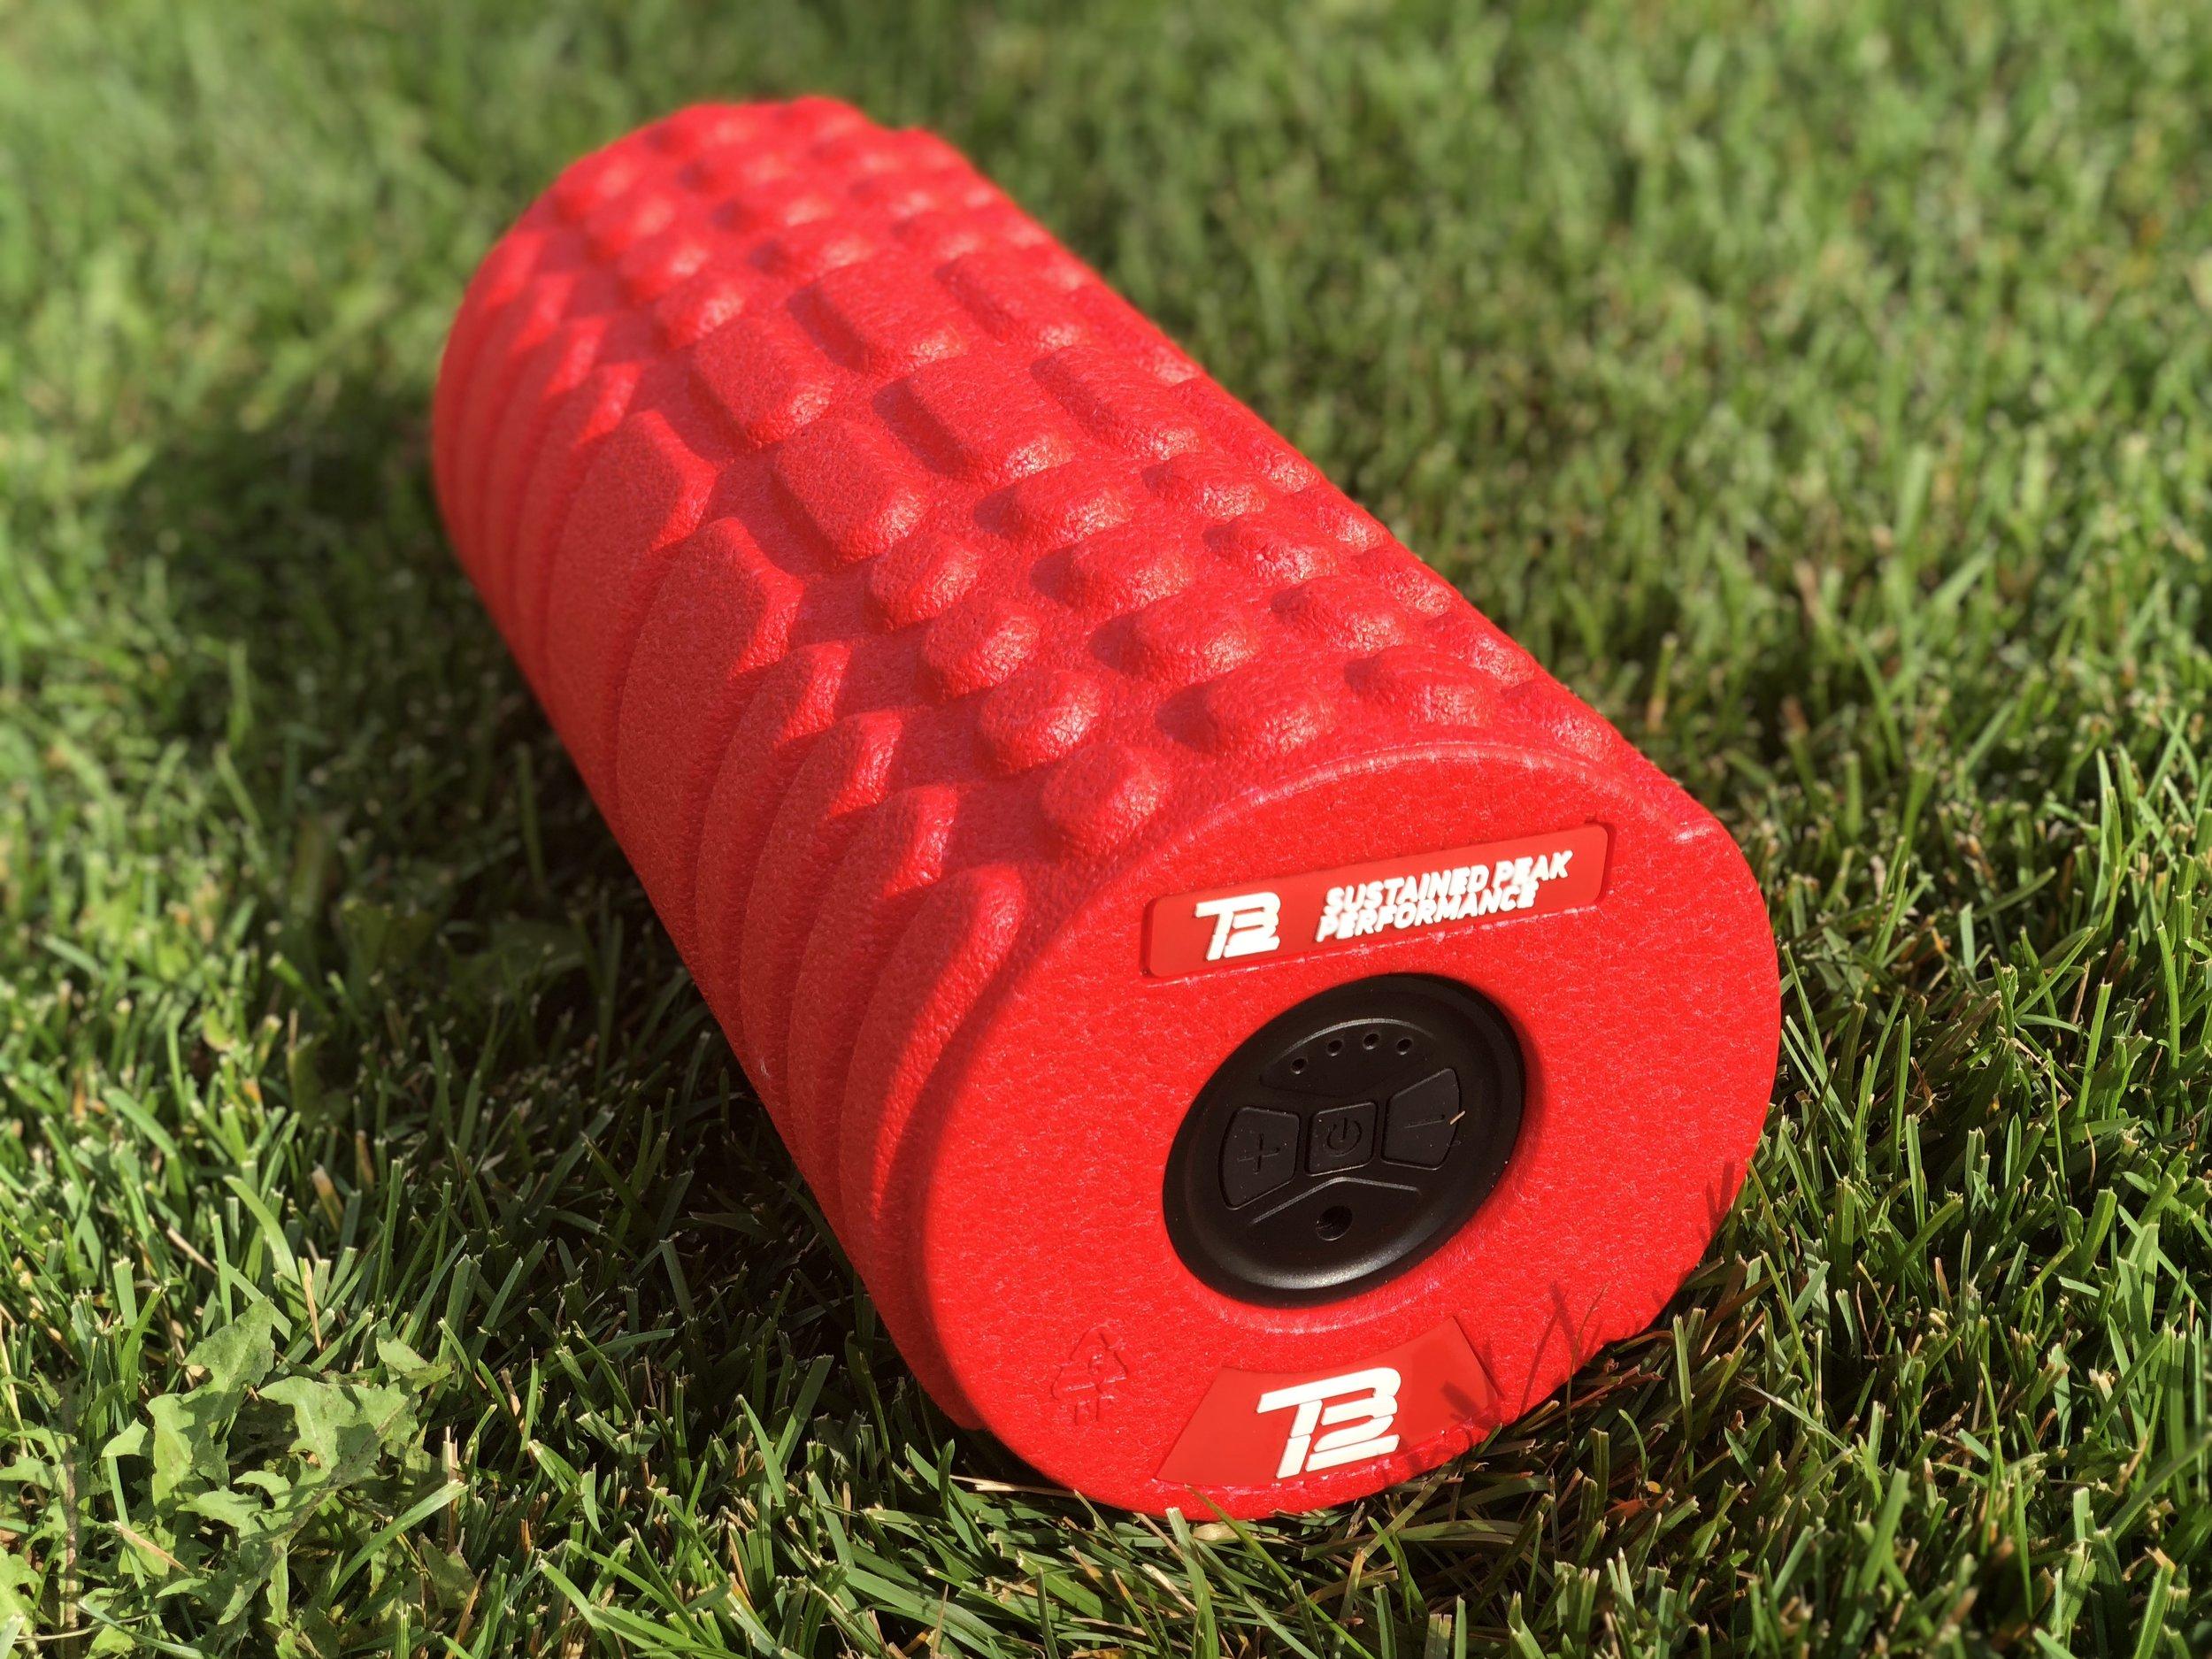 tb12-pliability-vibrating-roller.jpg